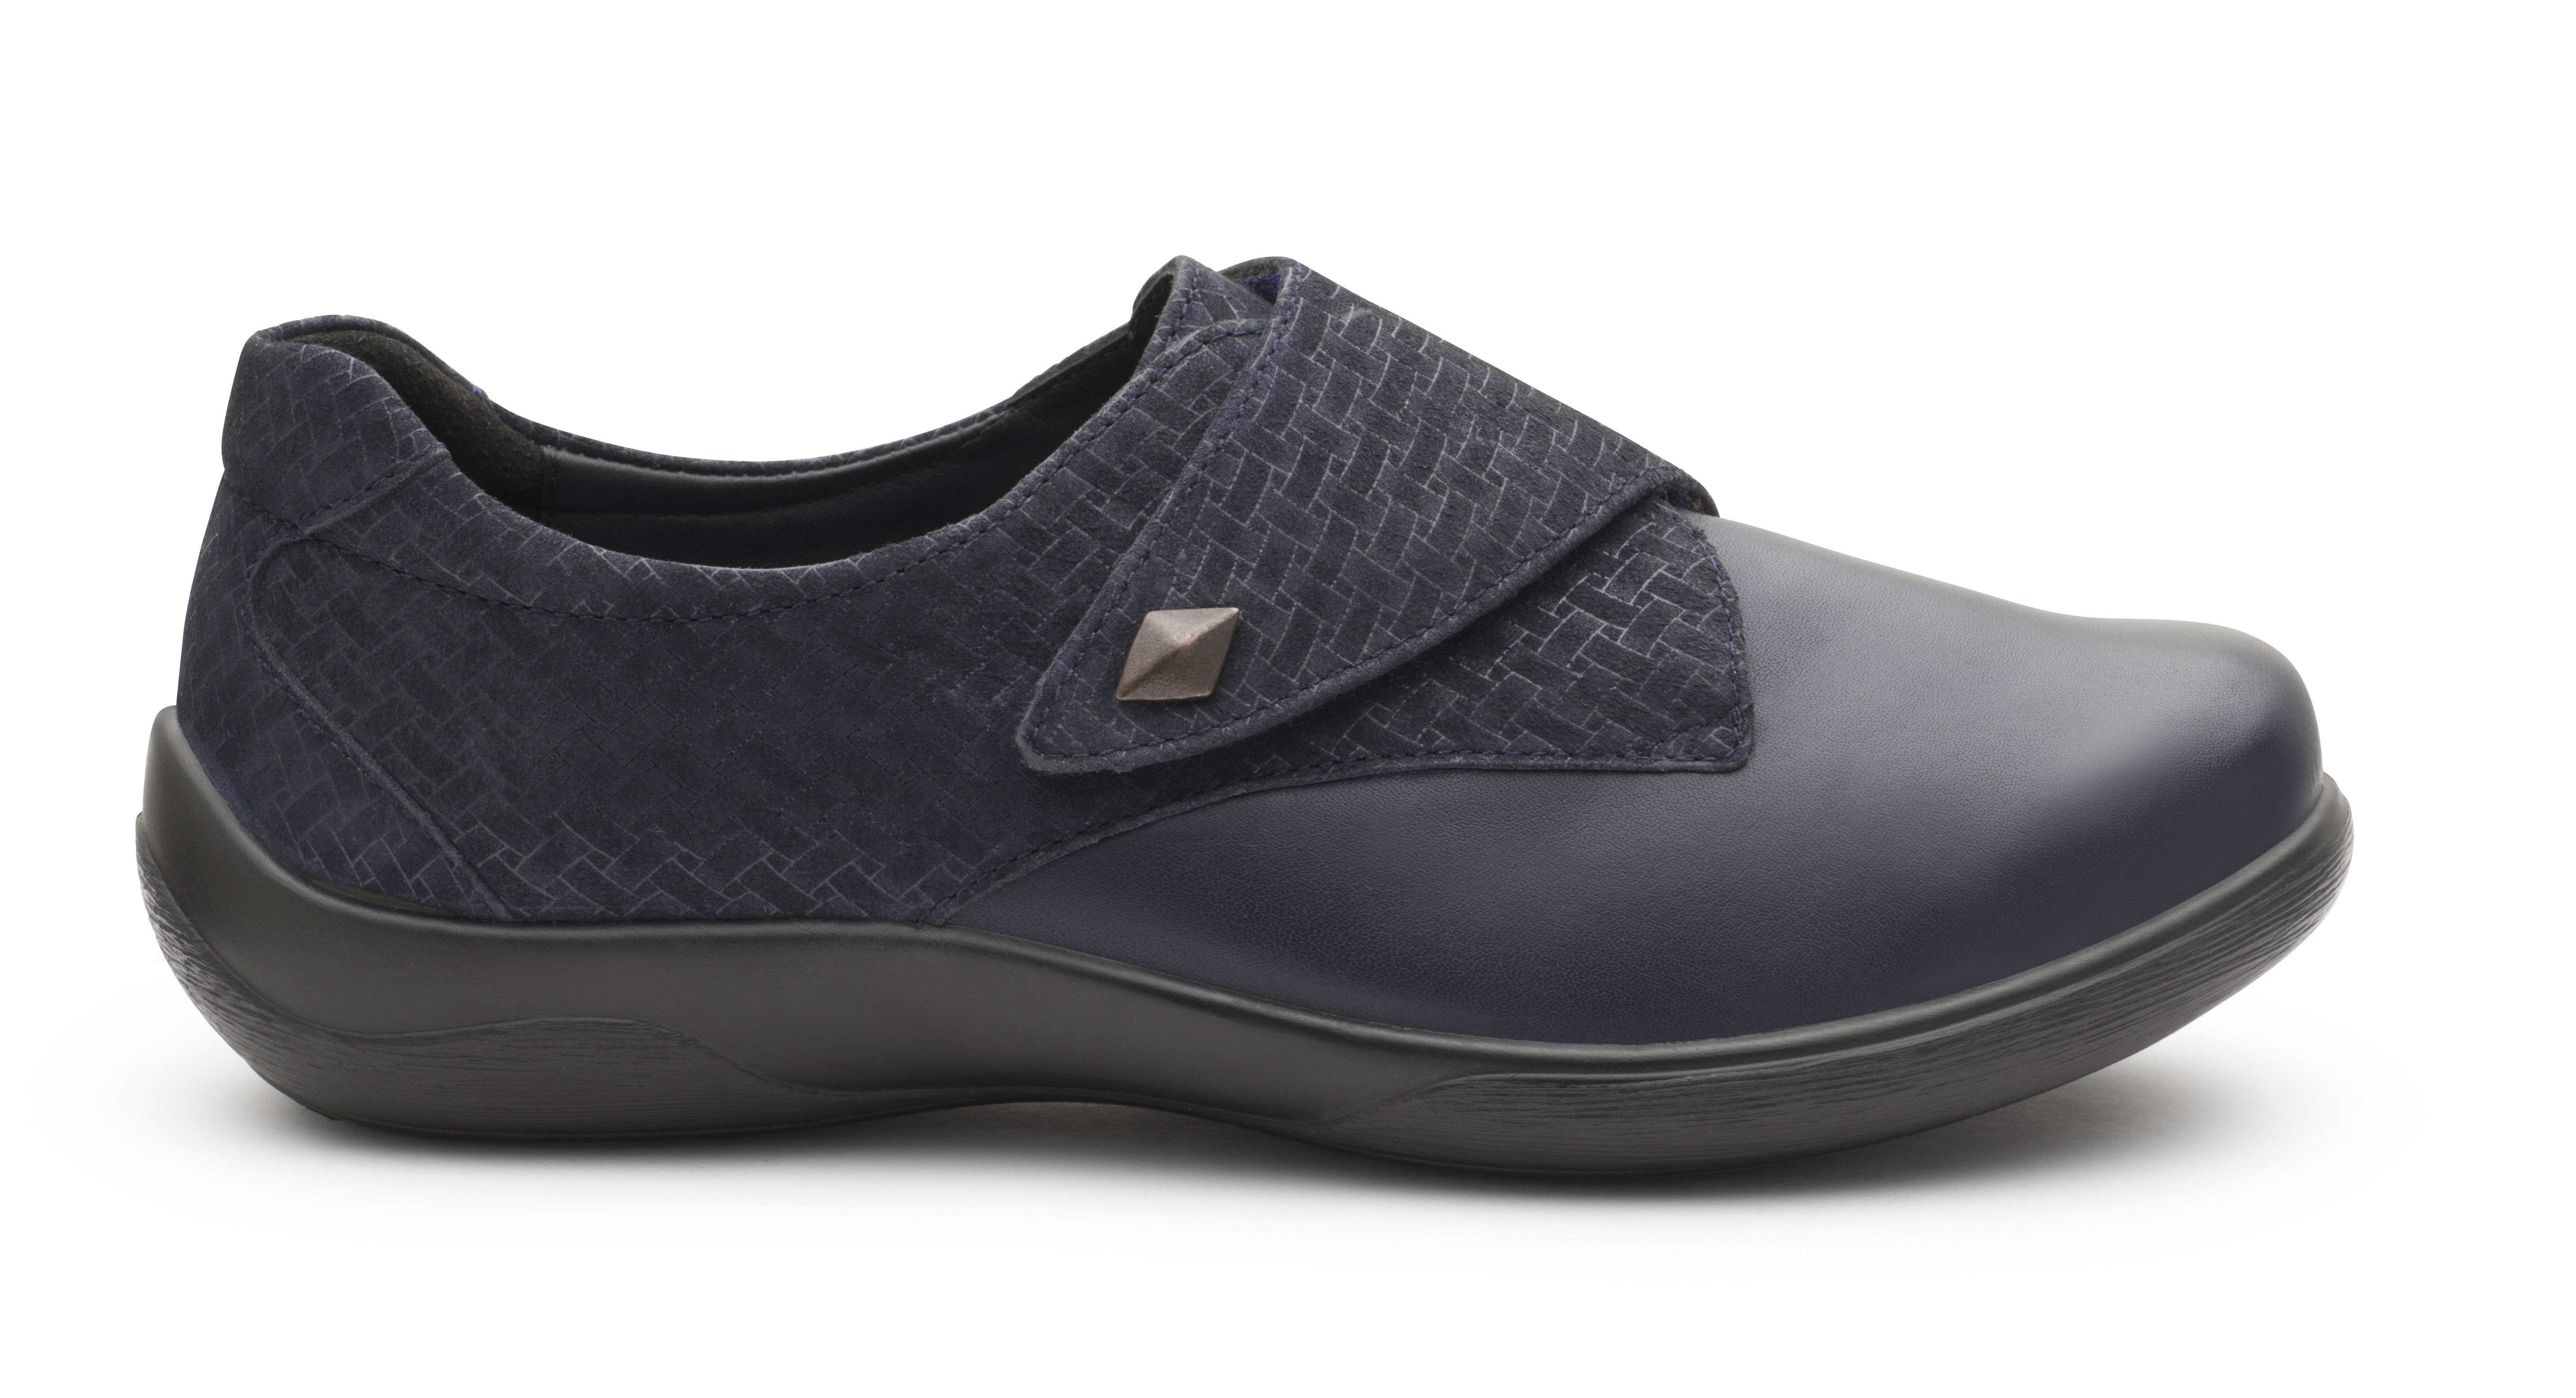 Padders Viola Ladies Shoes - Mobility